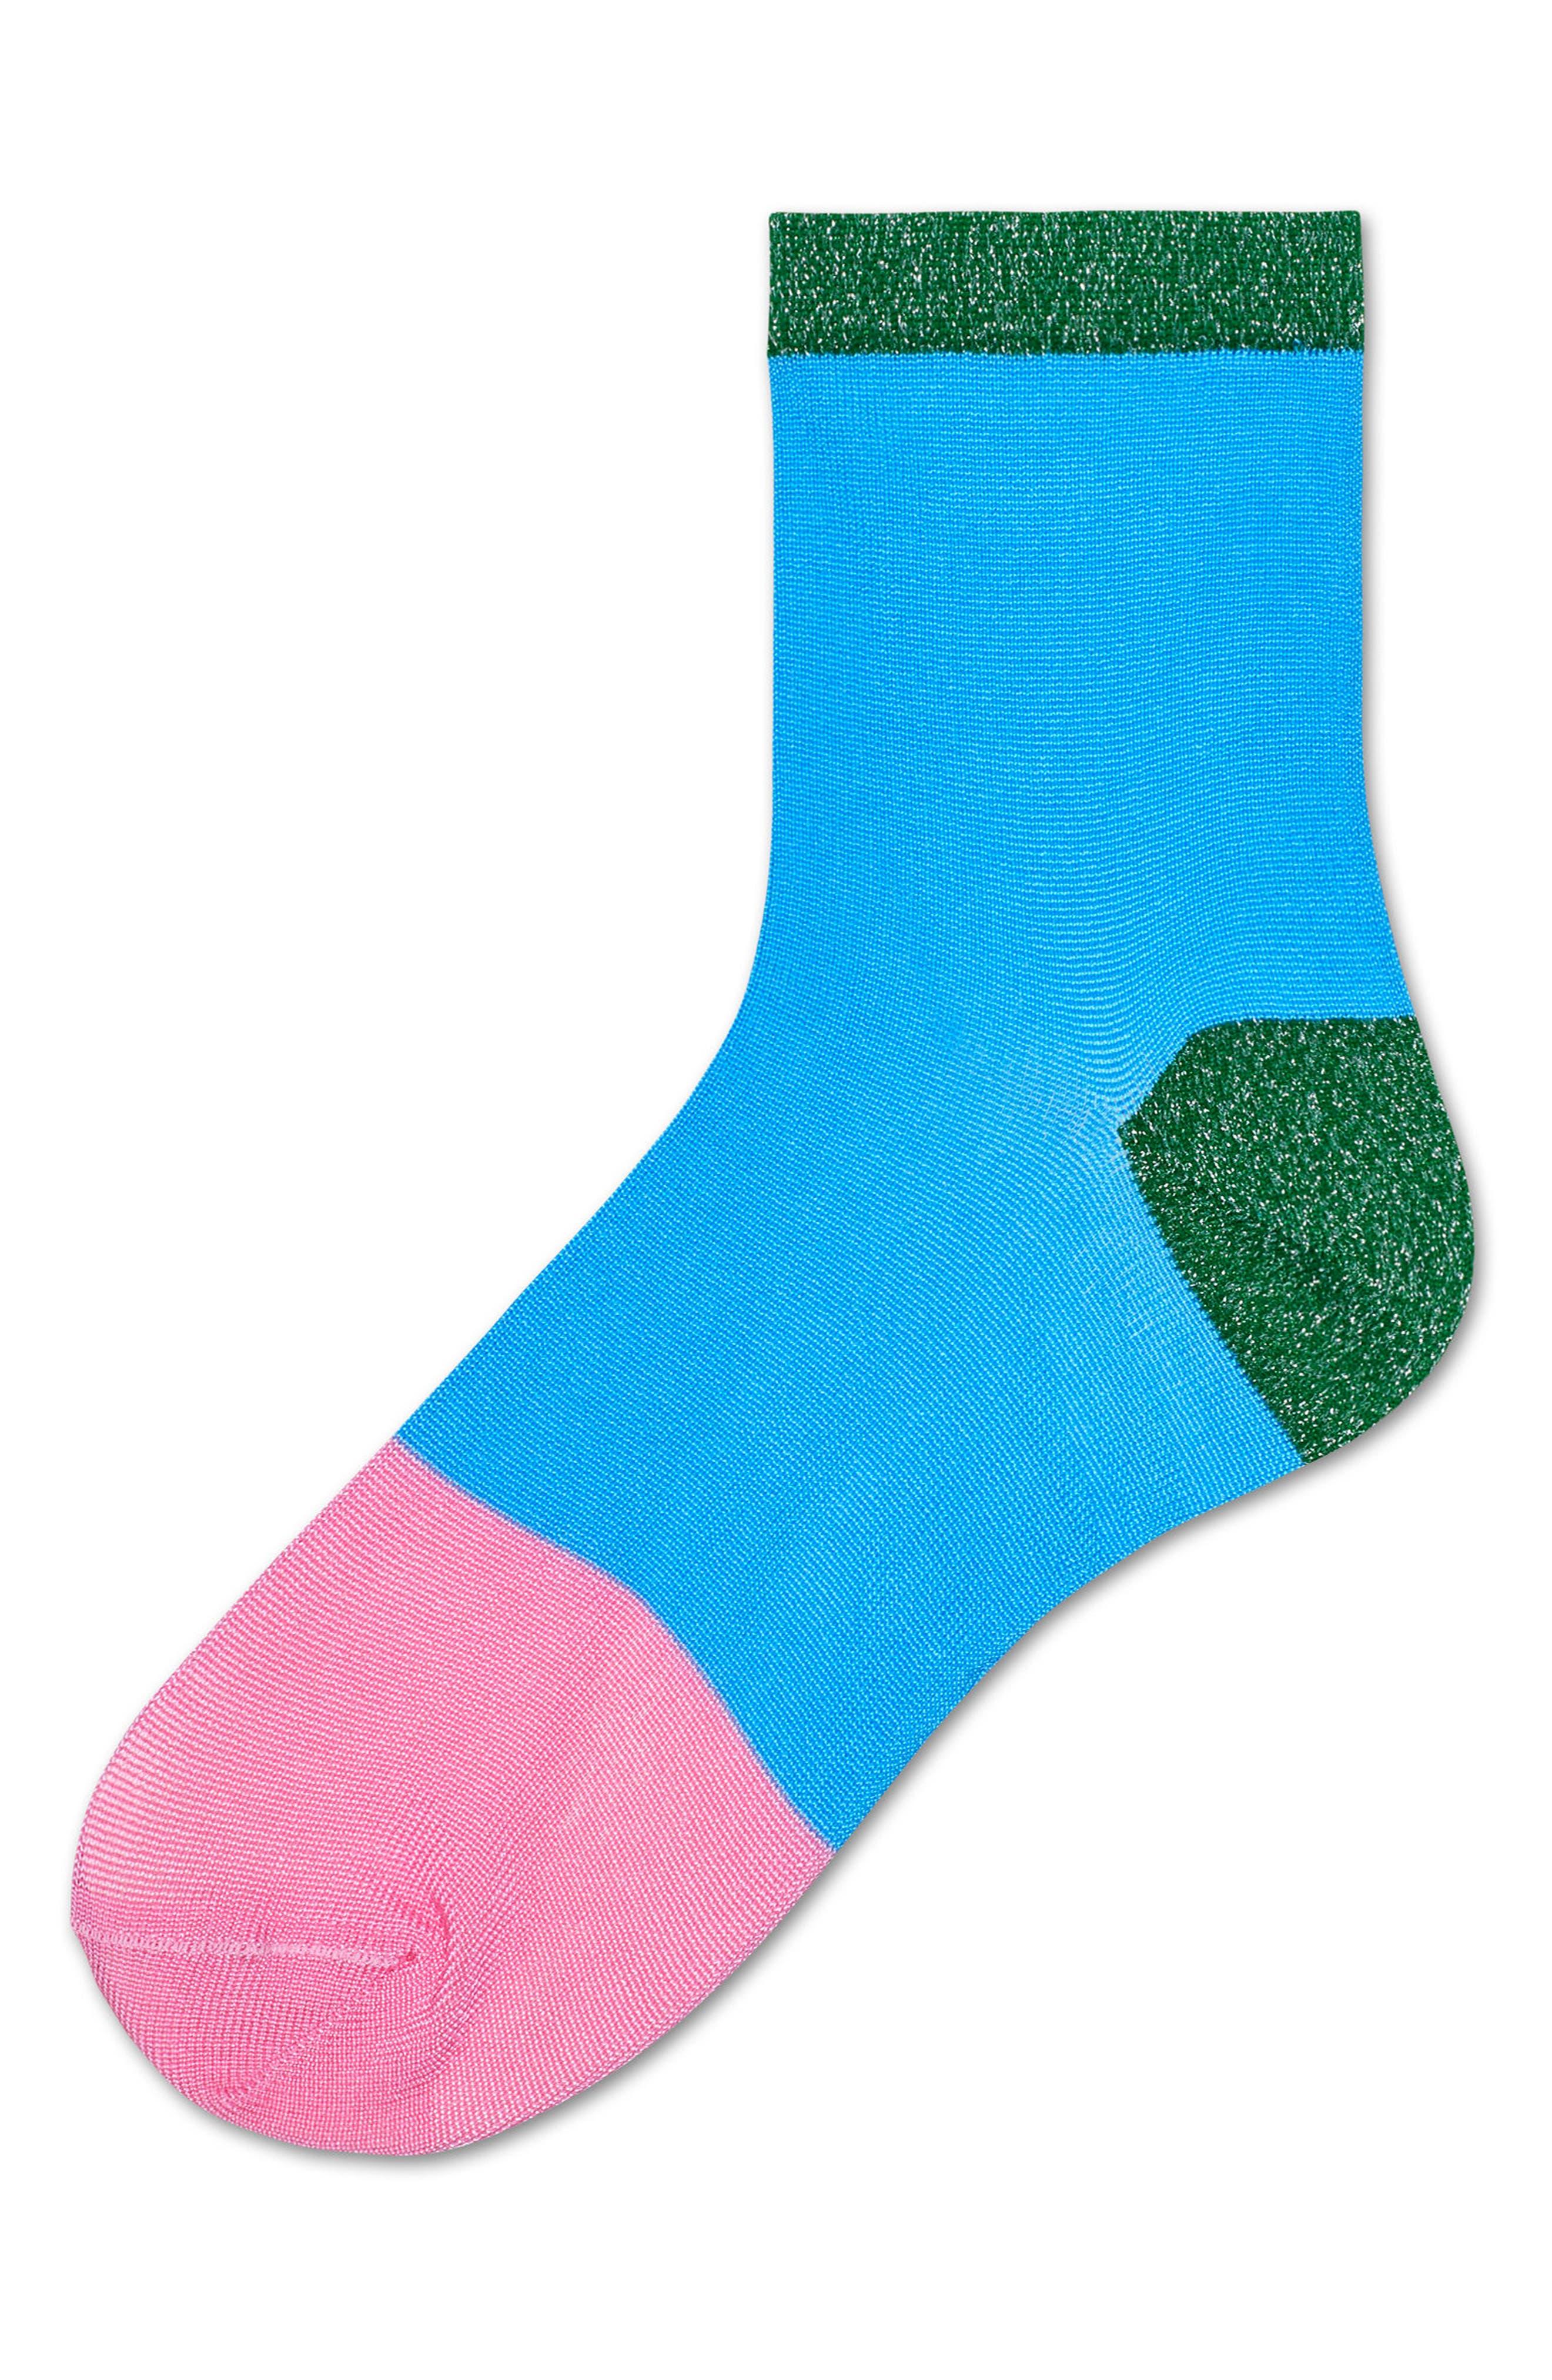 Alternate Image 3  - Hysteria by Happy Socks Liza Sparkle Ankle Socks